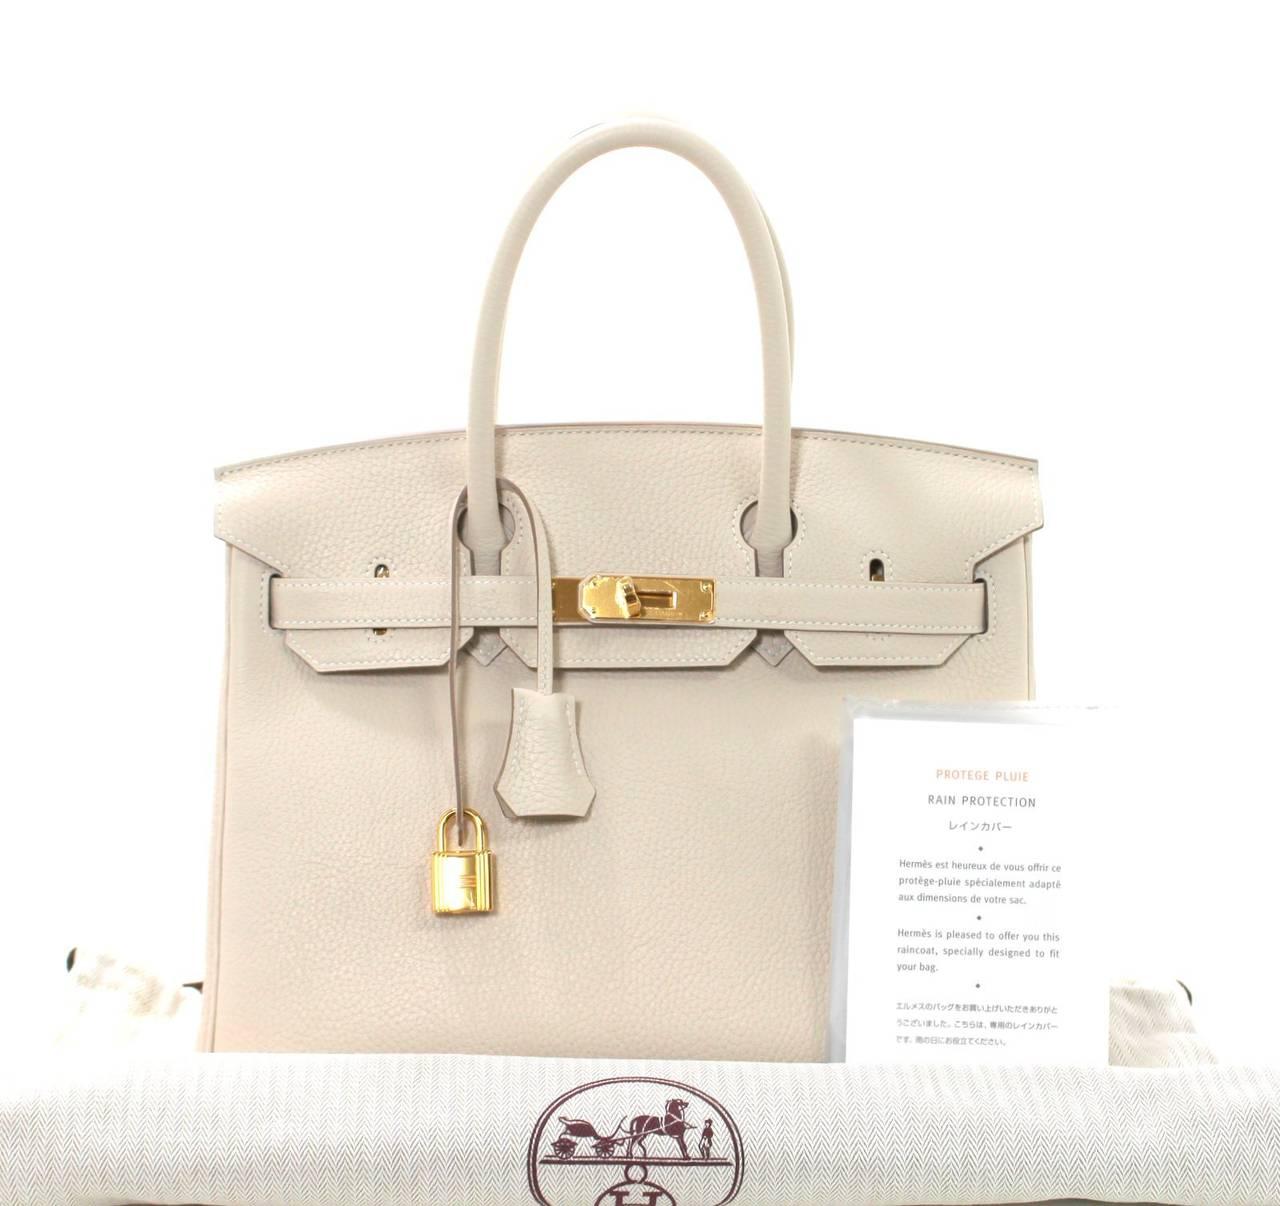 hermes leather bag - Hermes Birkin Bag in Craie Clemence with Gold- Bone color 30 cm ...